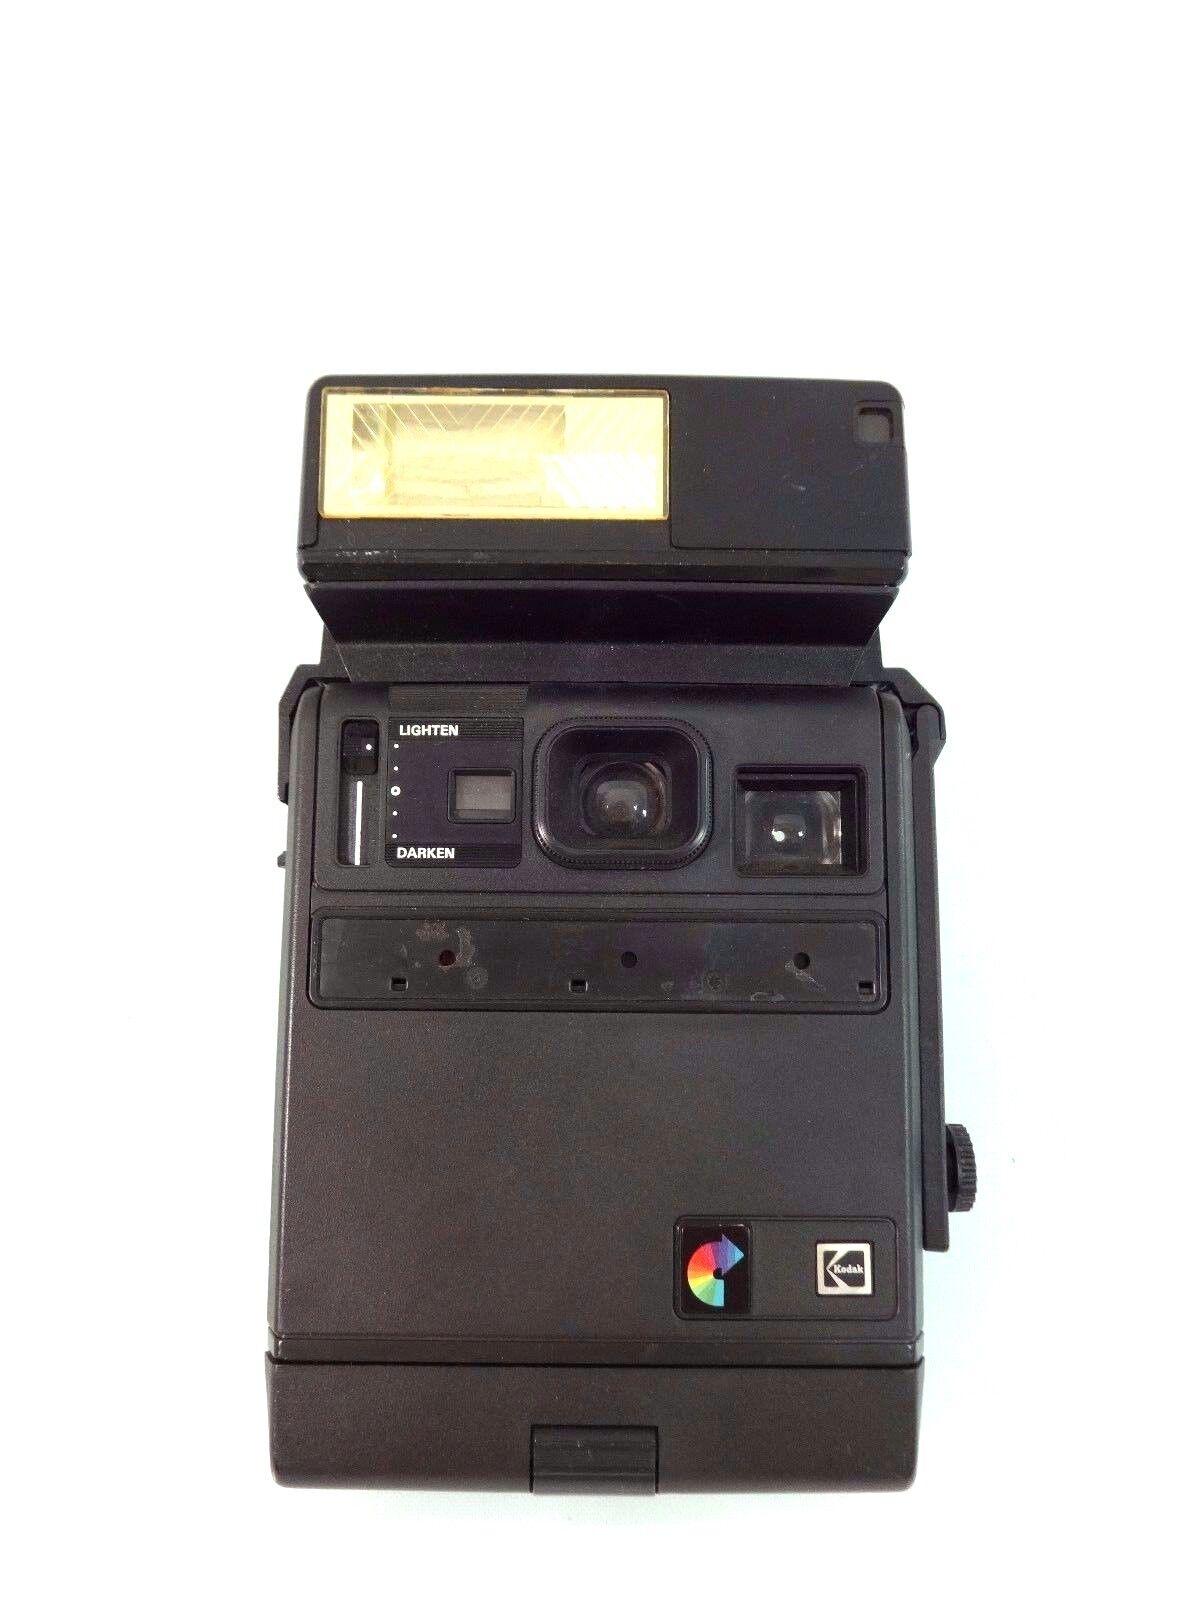 VINTAGE KODAK POLAROID EK160 INSTANT CAMERA WITH INSTANT FLASH MODEL C   eBay